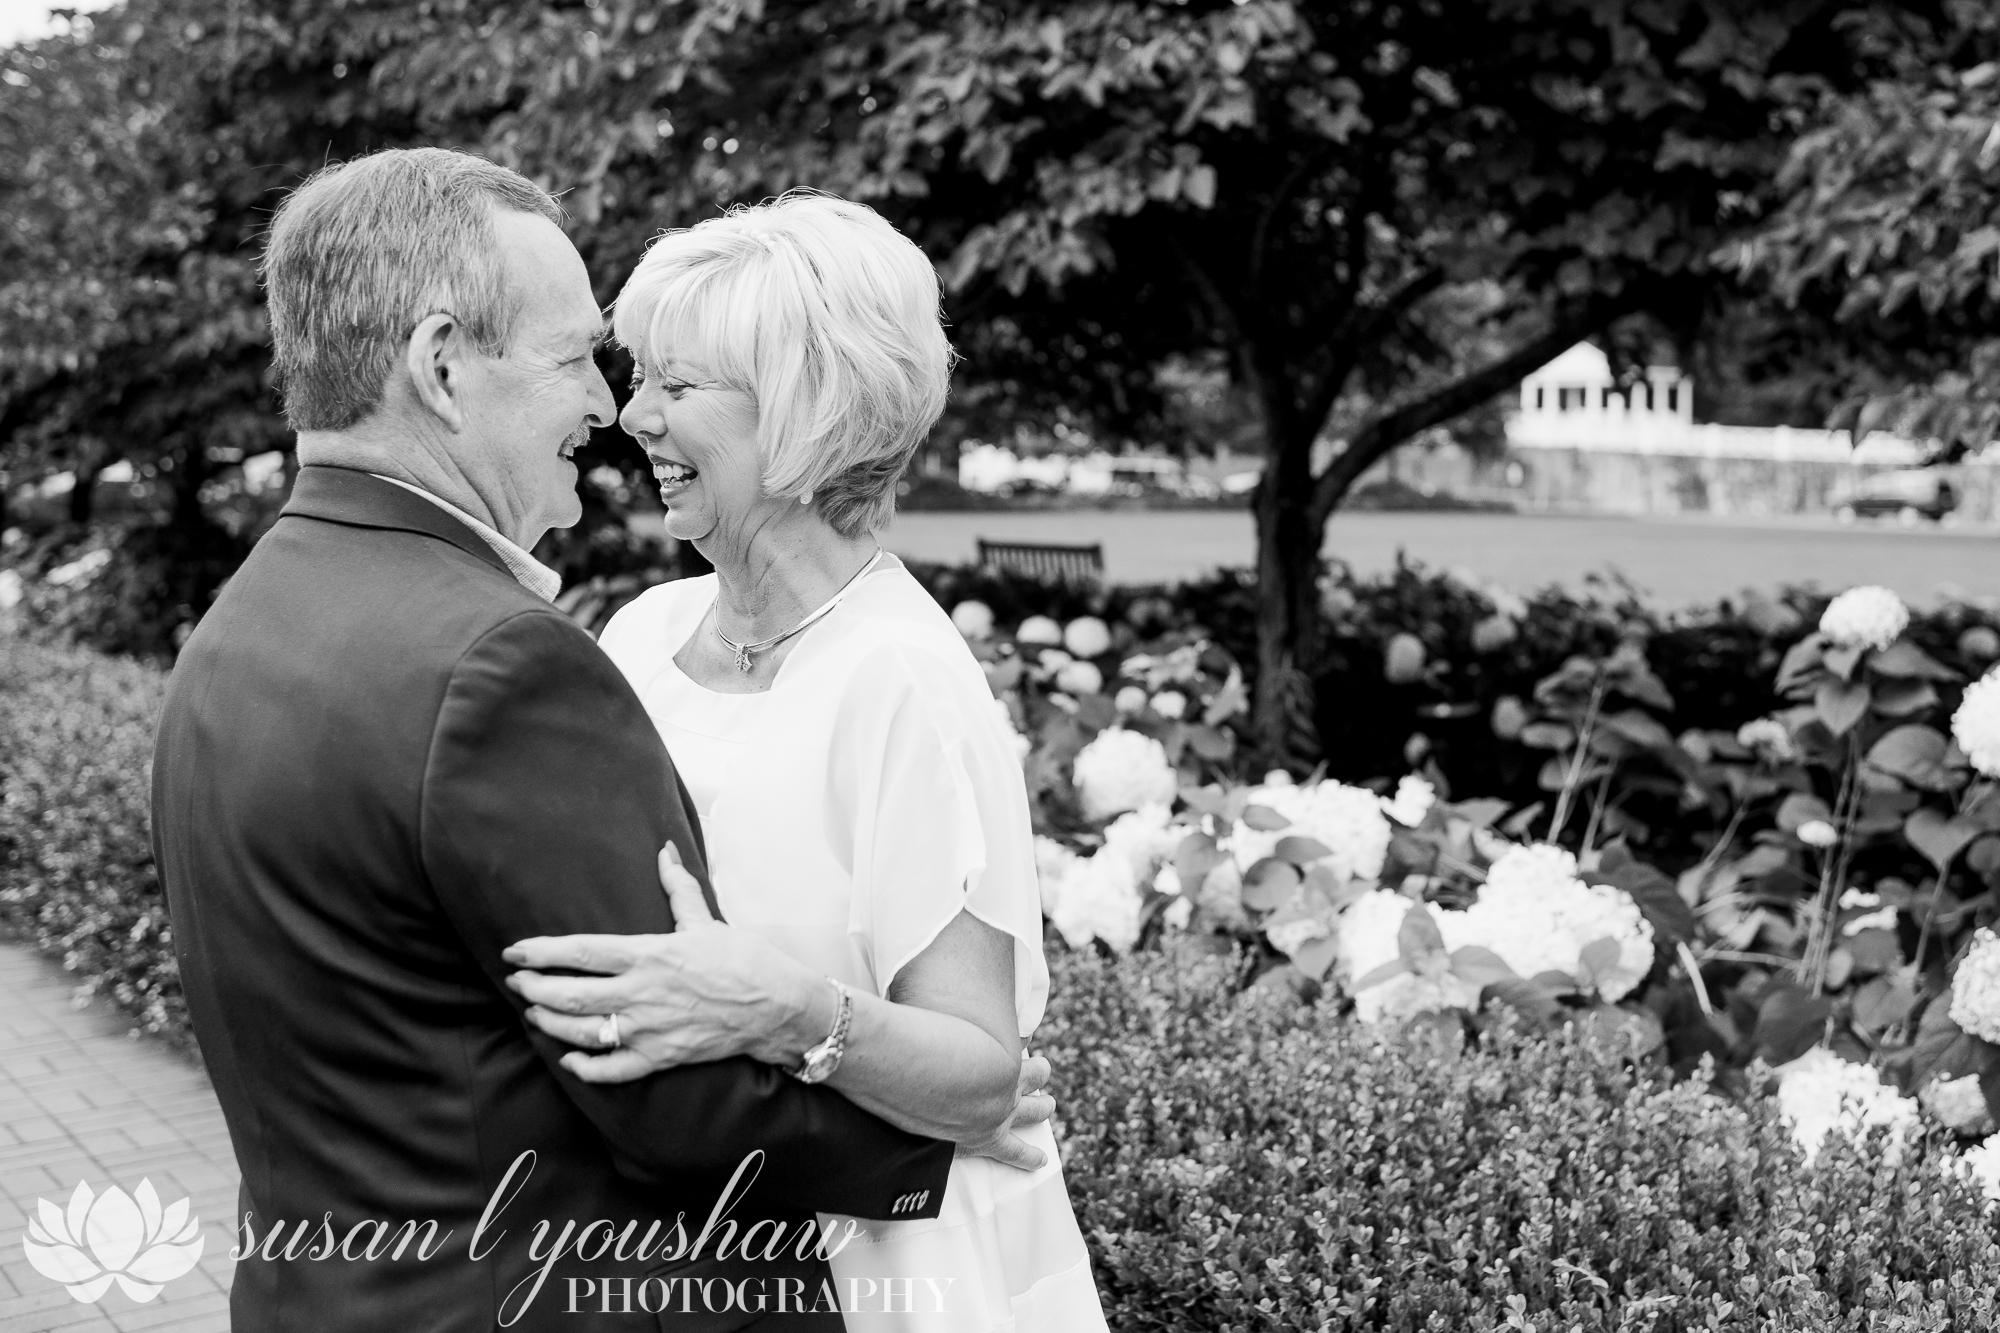 BLOG Carolyn Adams and Jim McCune 07-04-2018 SLY Photography-33.jpg